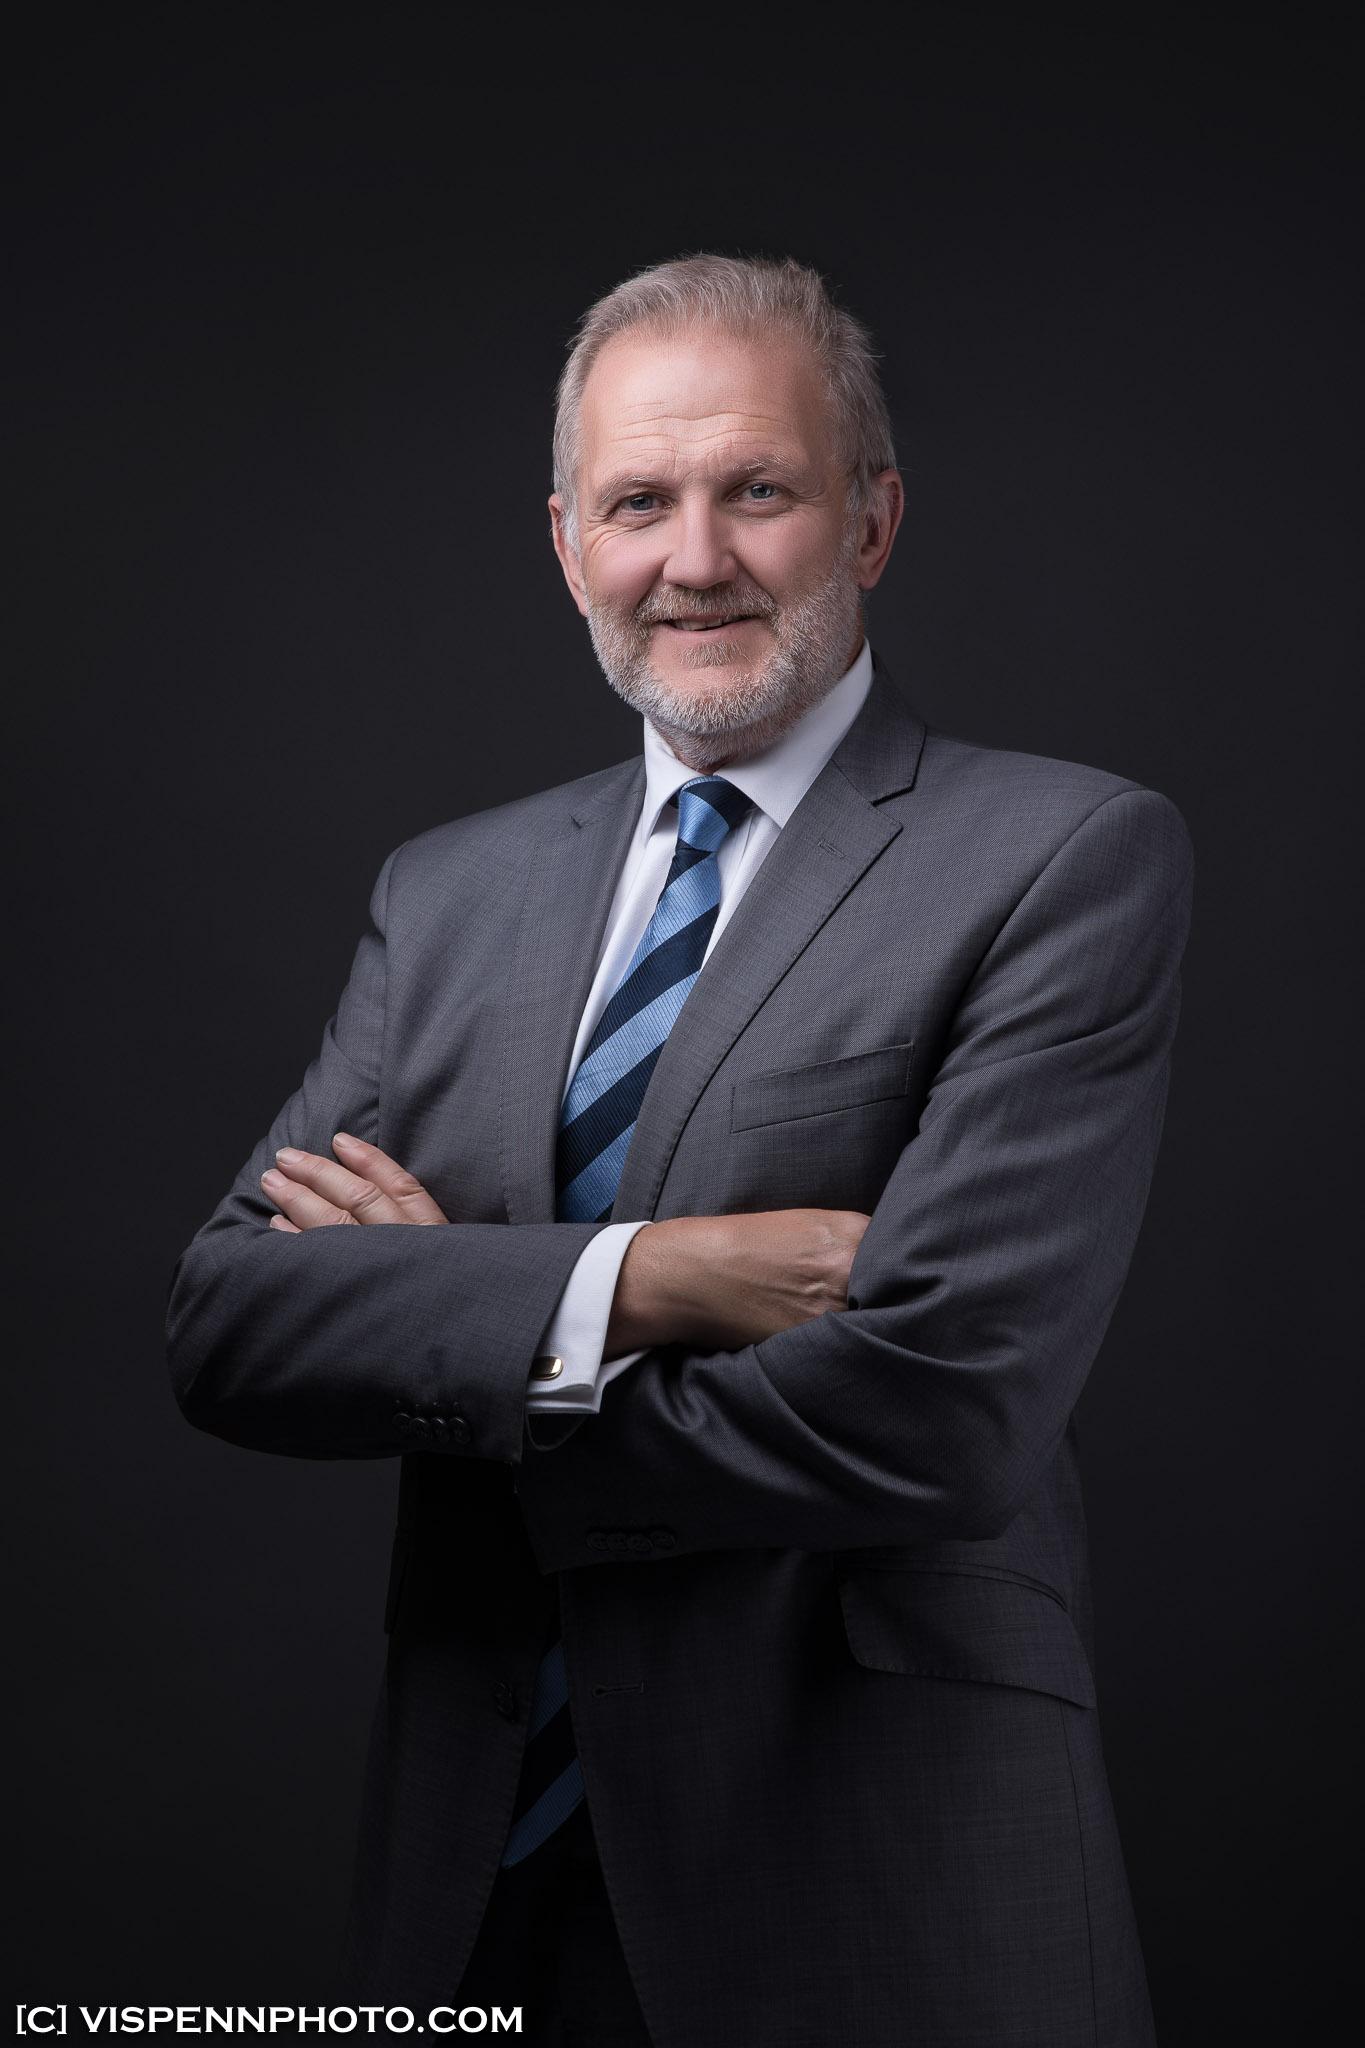 Headshot Melbourne Business Corporate Portraits VISPENN 墨尔本 商务 肖像工作照 团队 形象照 LinkedIn 头像 5D5 3926